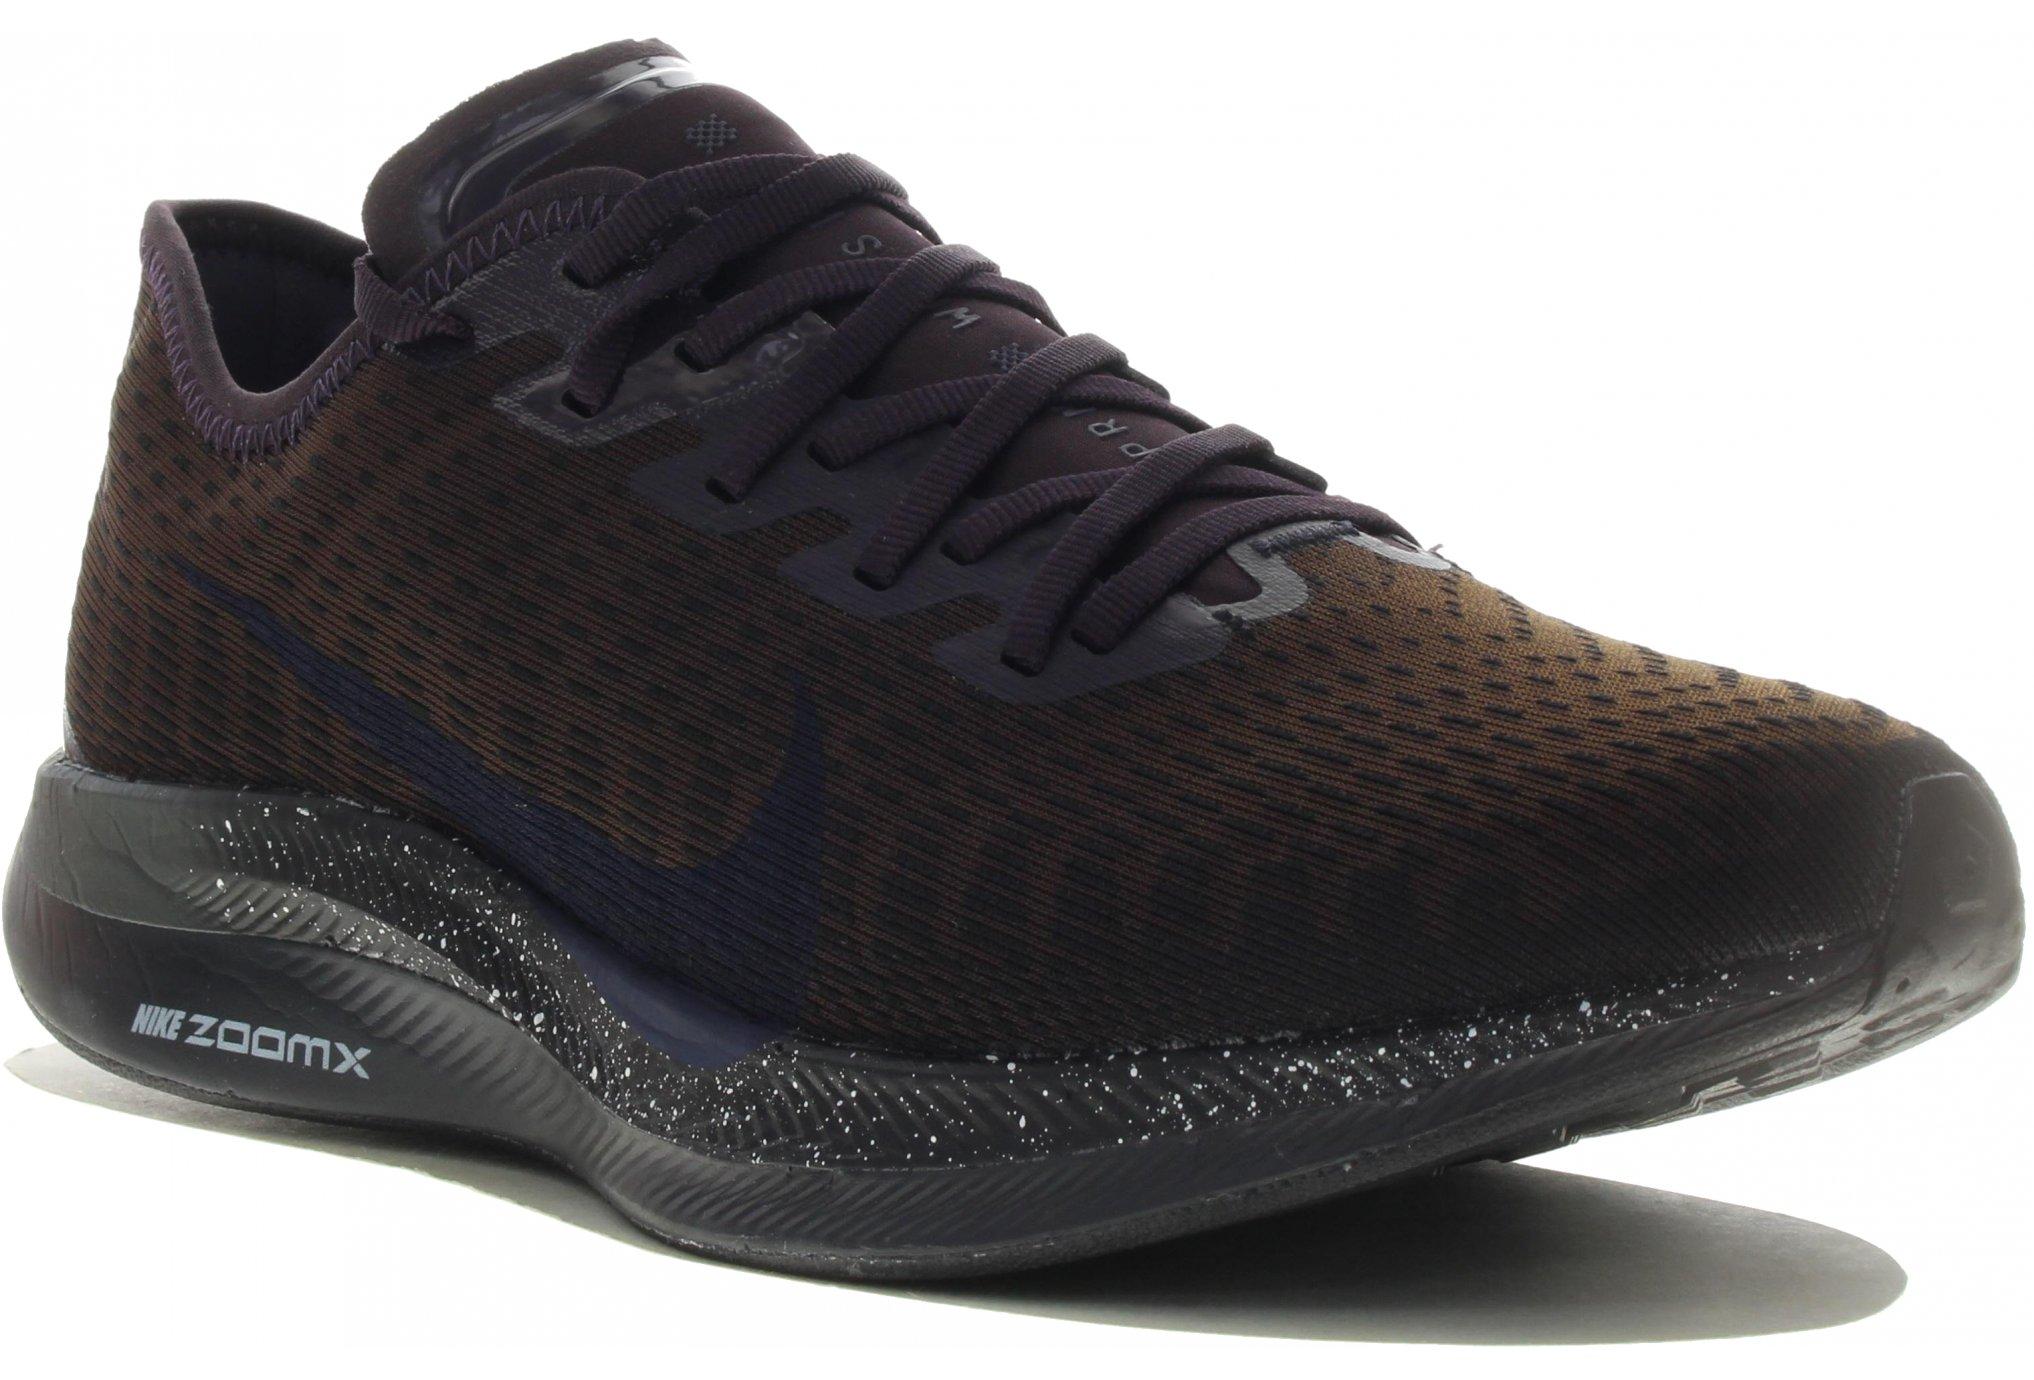 Nike Zoom Pegasus Turbo 2 SE Chaussures running femme